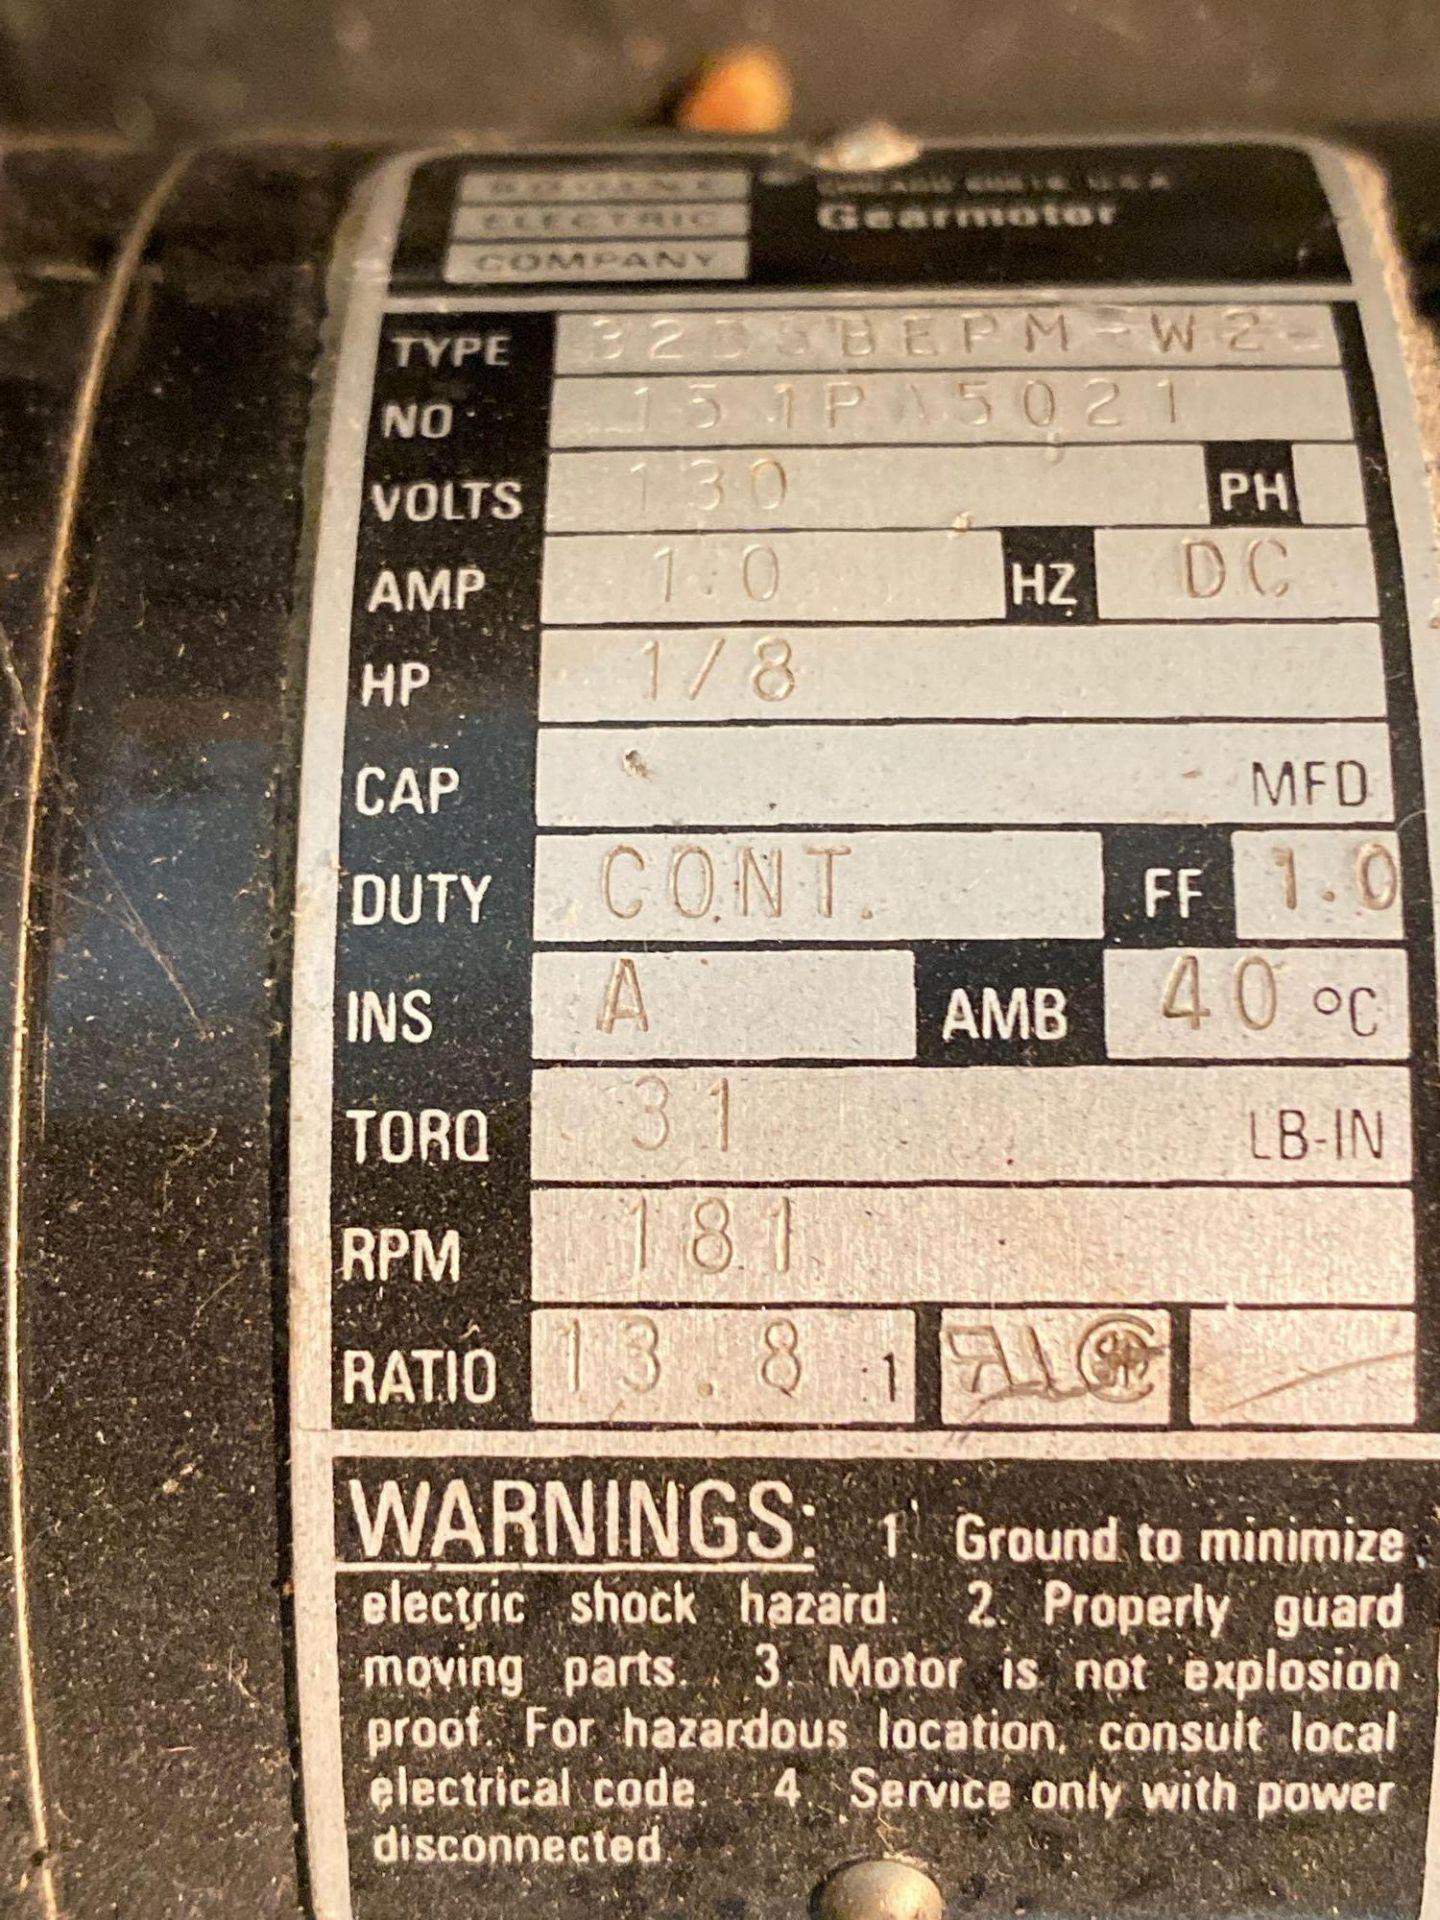 Label-Aire Model 3200 Conveyorized Pressure Sensitive Labeler - Image 11 of 14